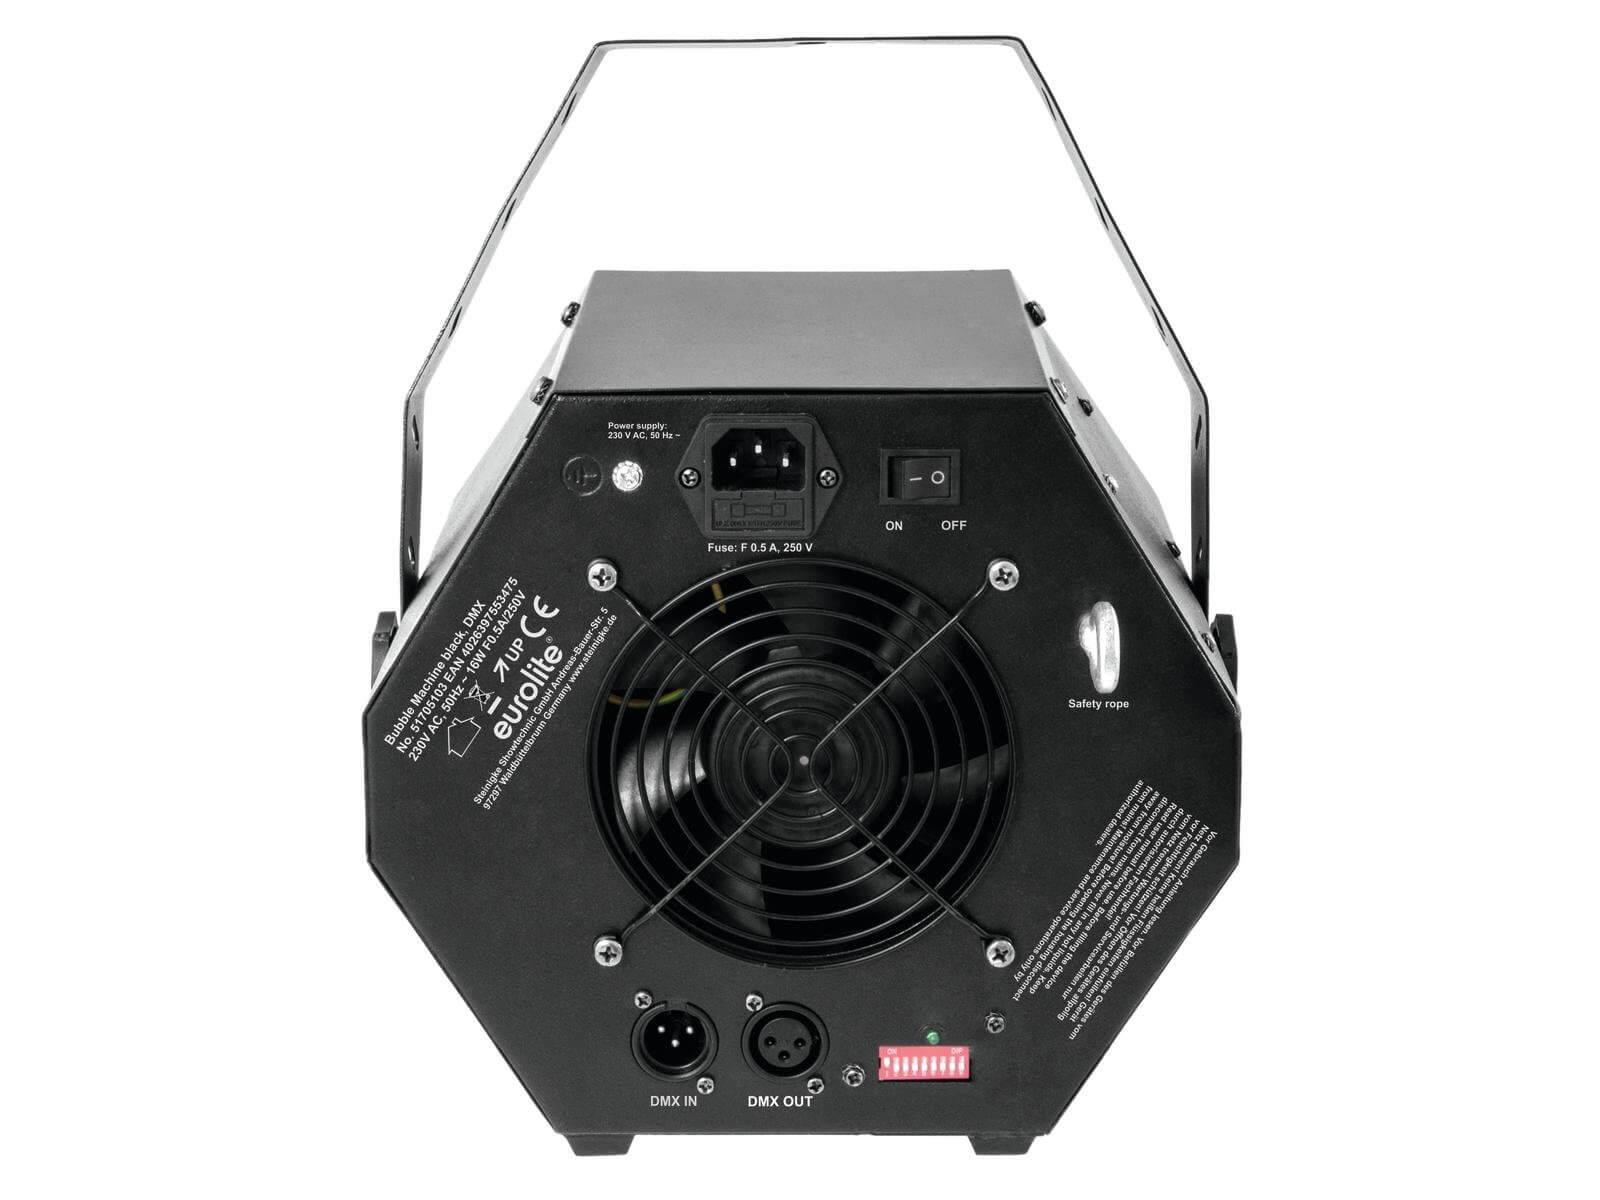 Eurolite B-100 Bubble Machine (Black) | Buy at Simply ...